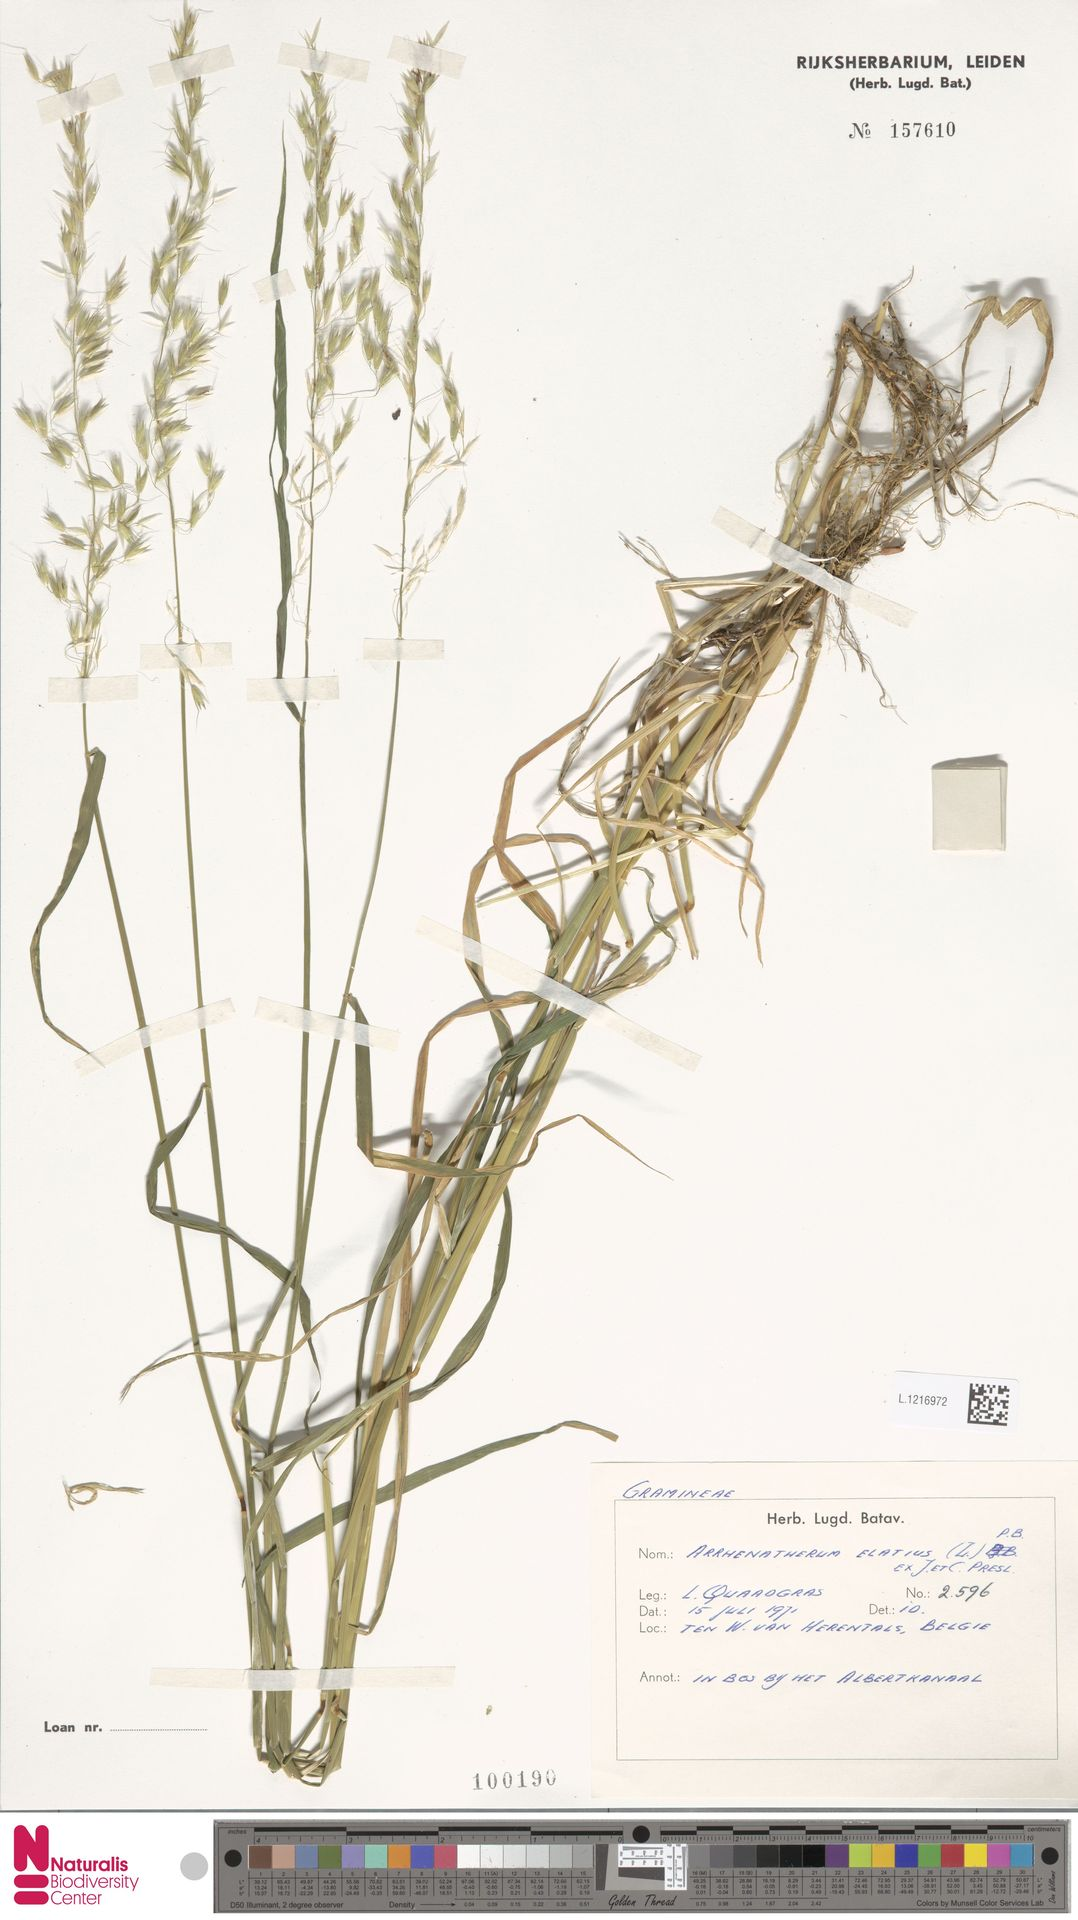 L.1216972   Arrhenatherum elatius (L.) P.Beauv. ex J.Presl & C.Presl